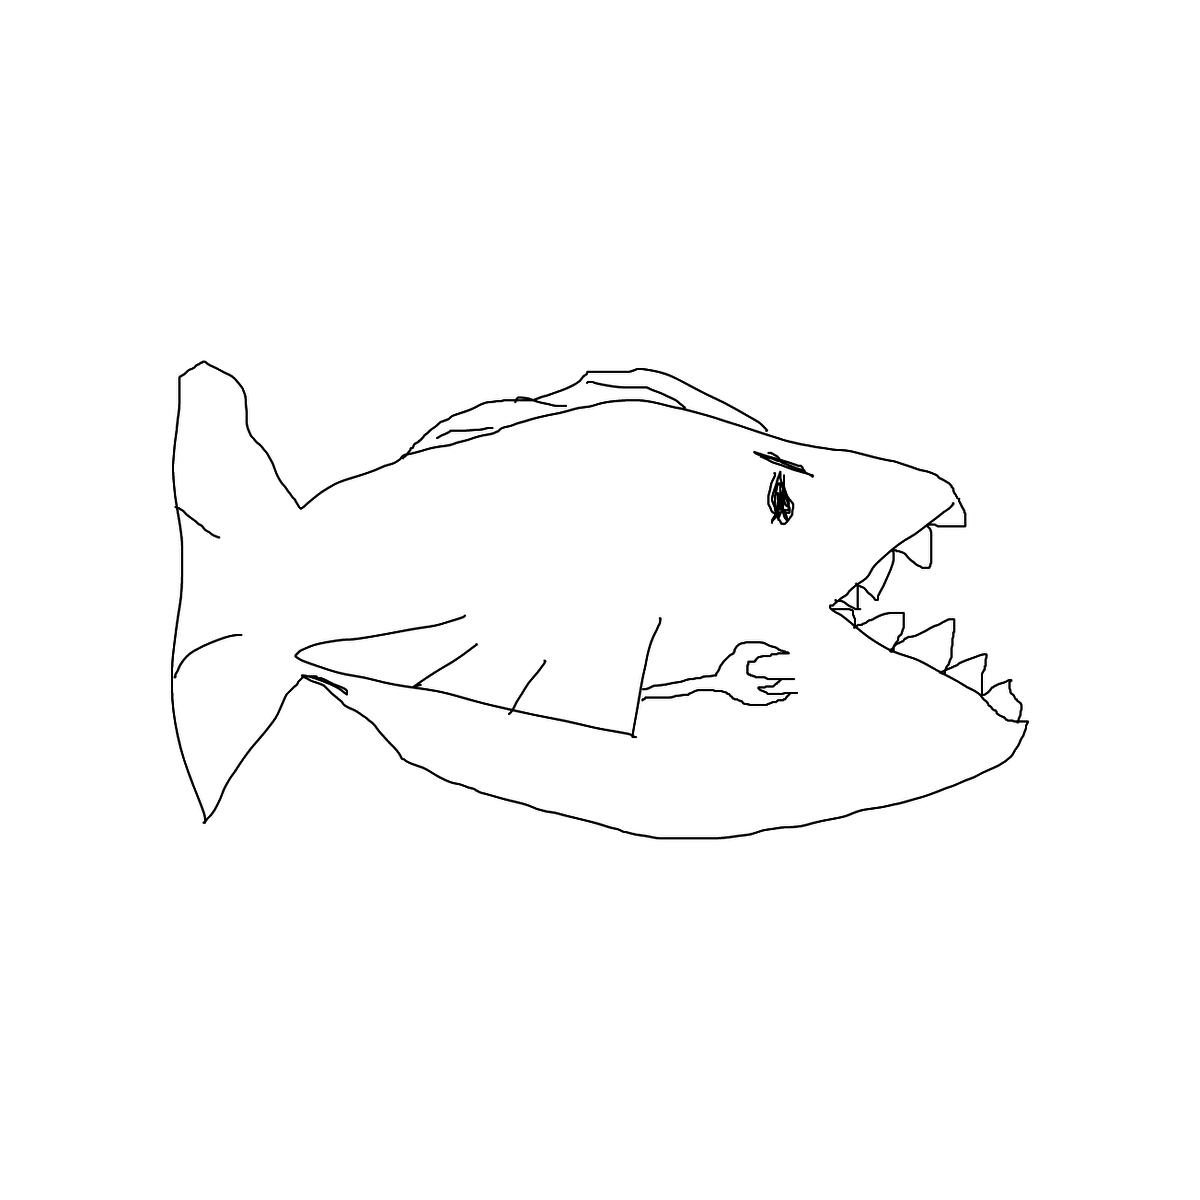 BAAAM drawing#10650 lat:43.5831260681152340lng: -79.3968811035156200